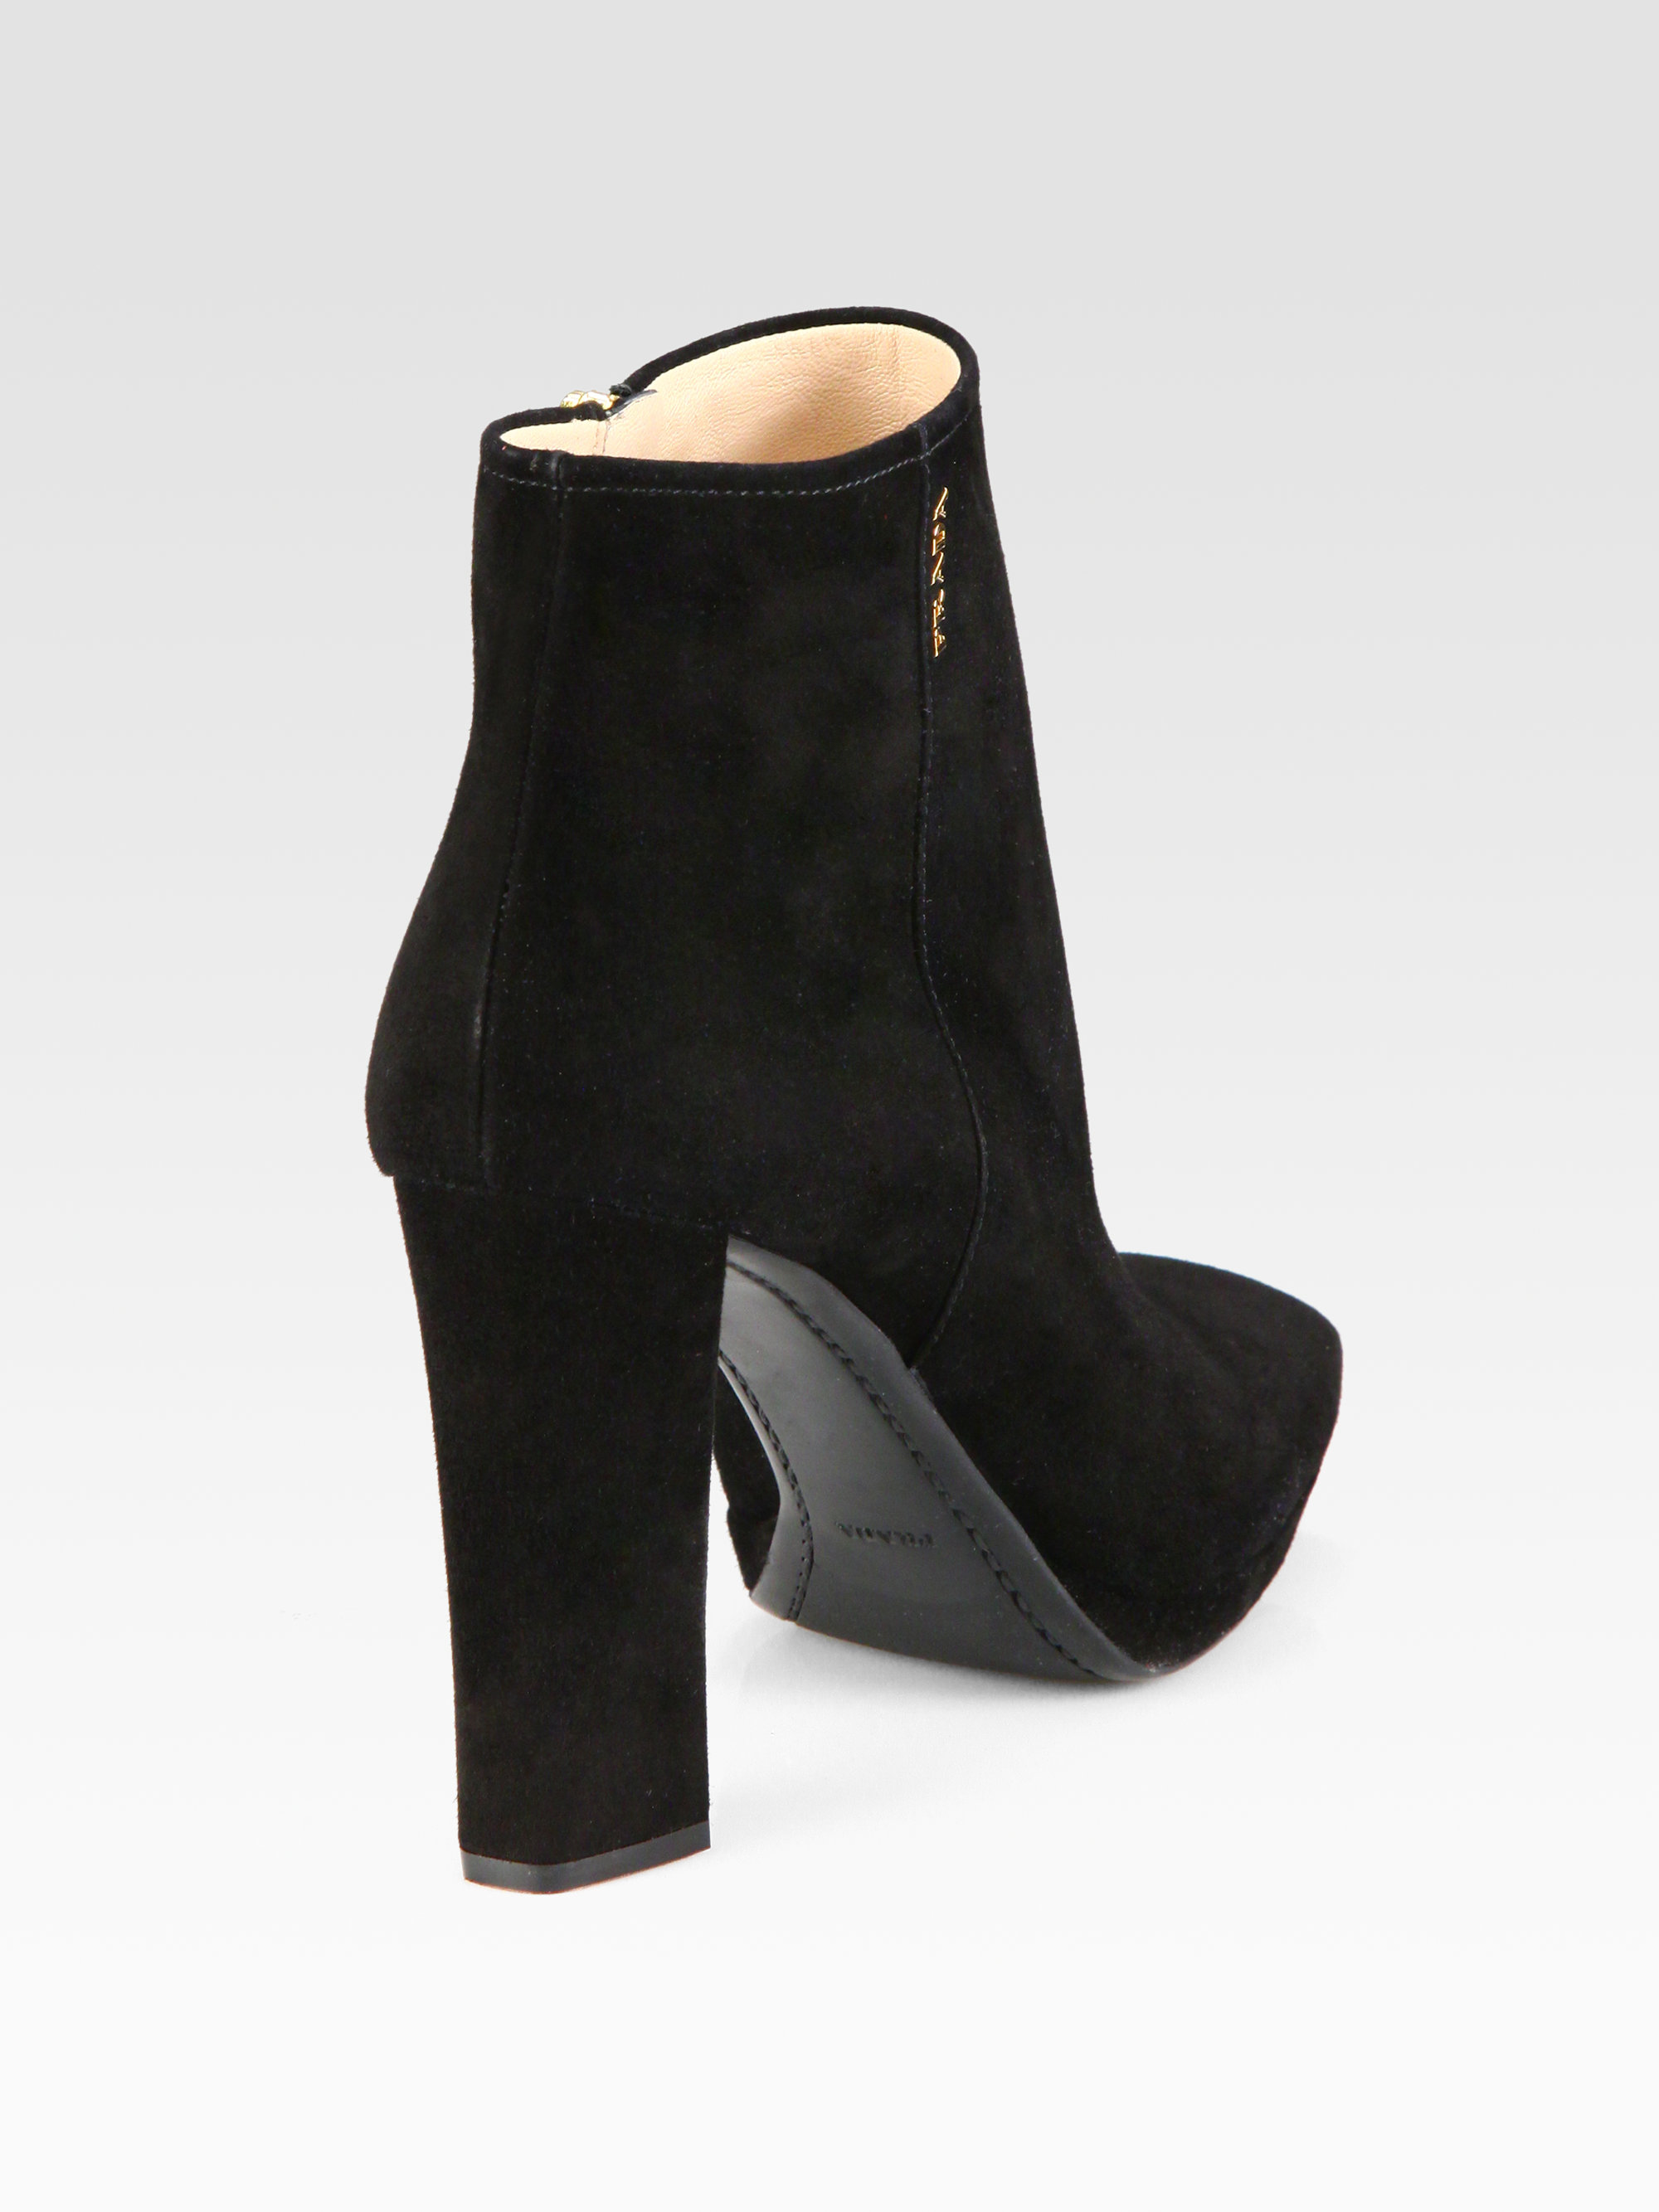 3c2ee7267c61 Prada Suede Platform Ankle Boots In Black Lyst